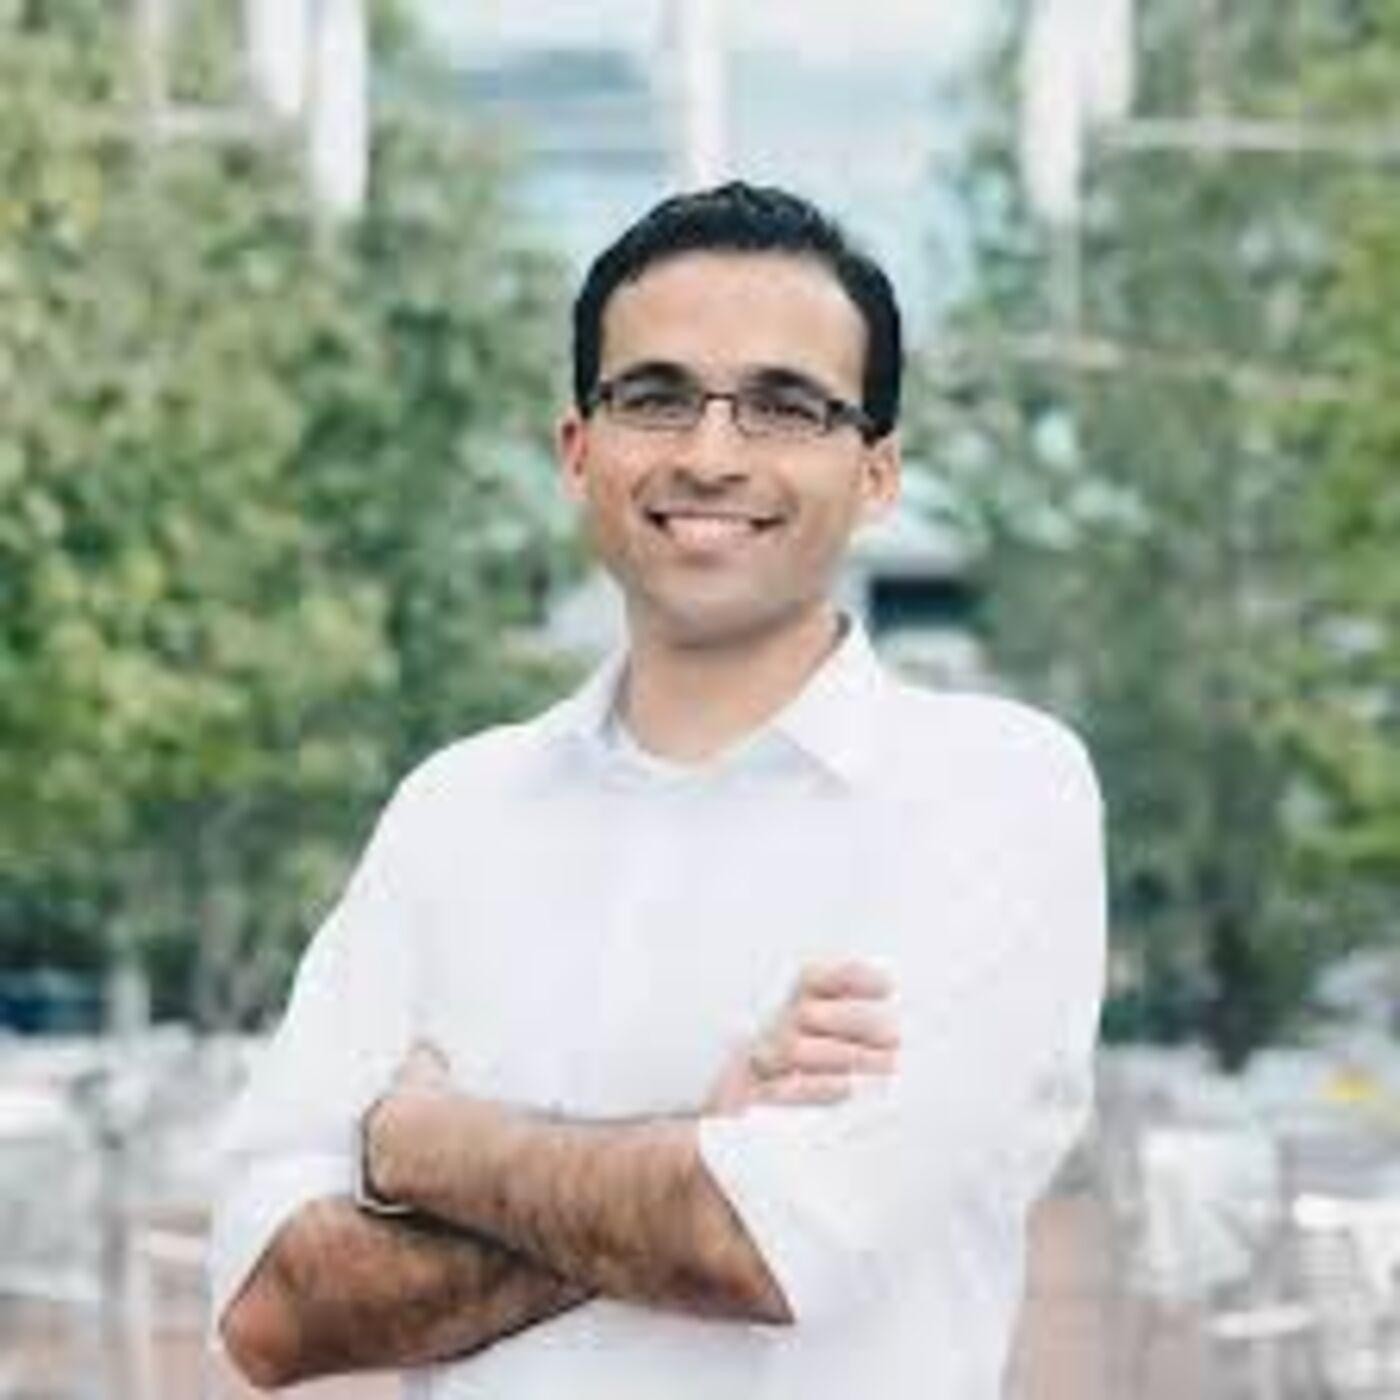 Raj Salhotra - Executive Director at Momentum Education